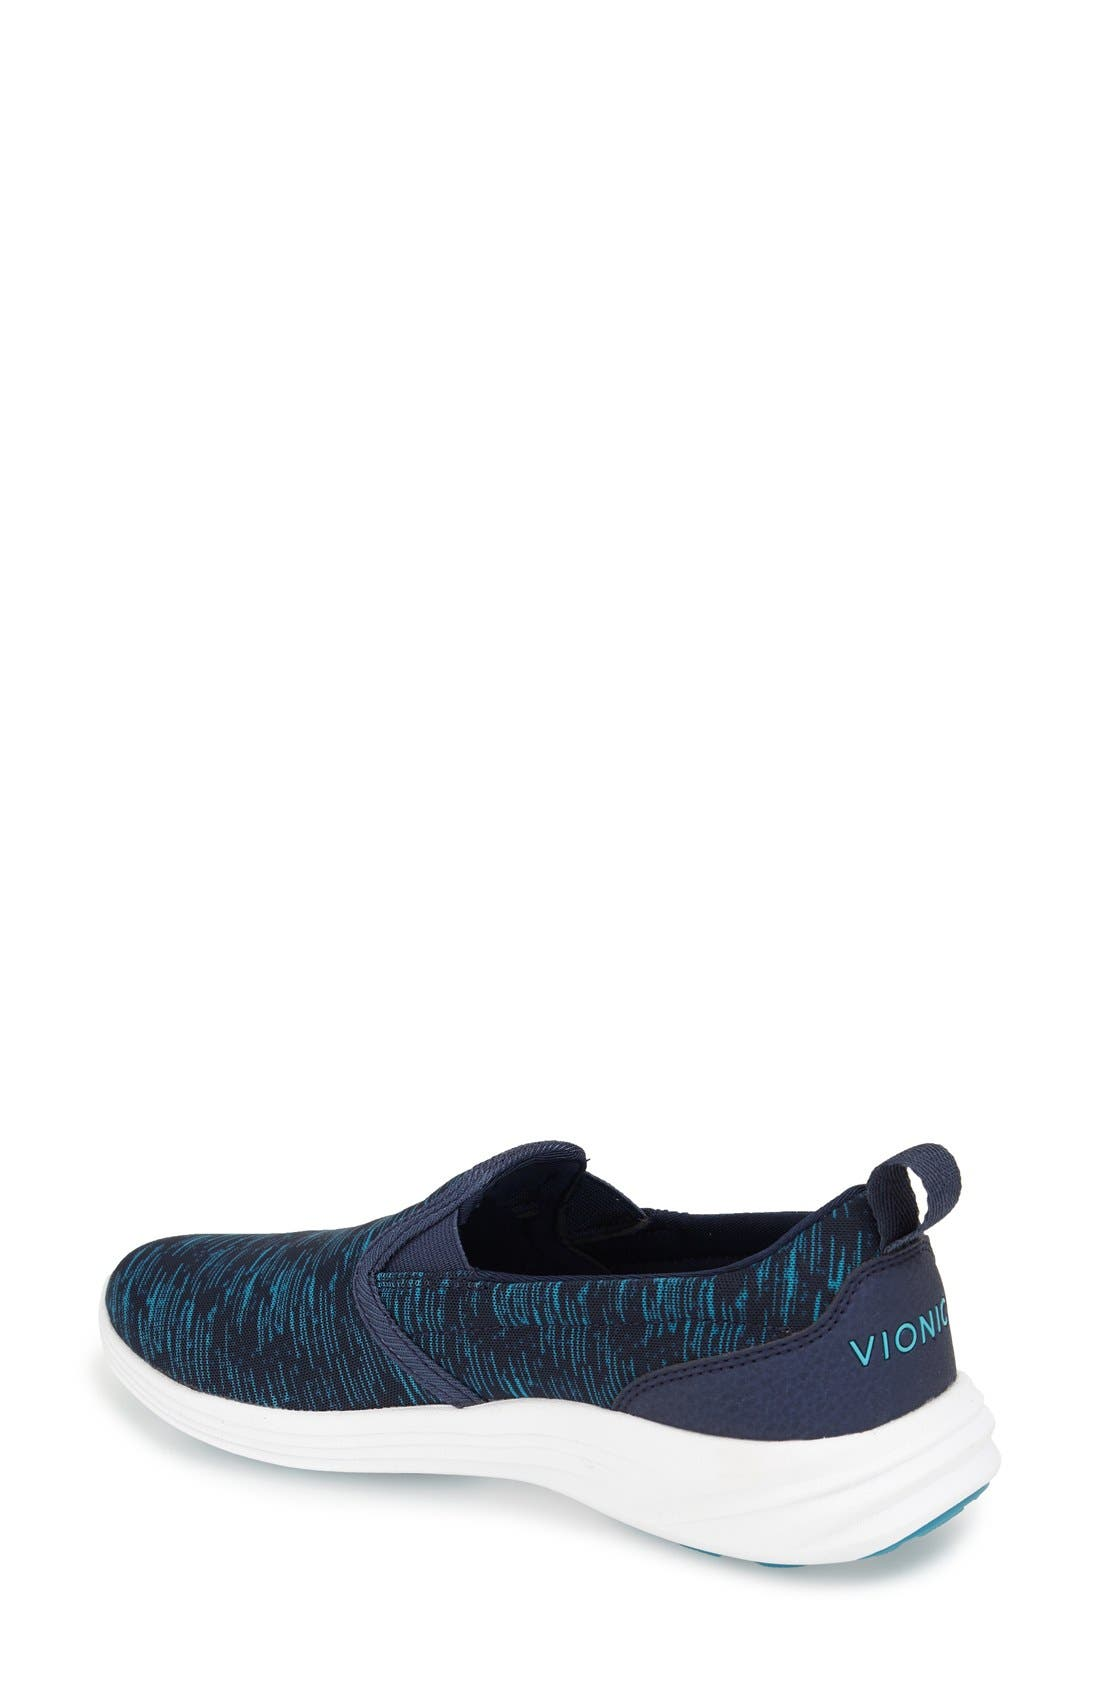 Alternate Image 2  - Vionic 'Kea' Slip-On Sneaker (Women)